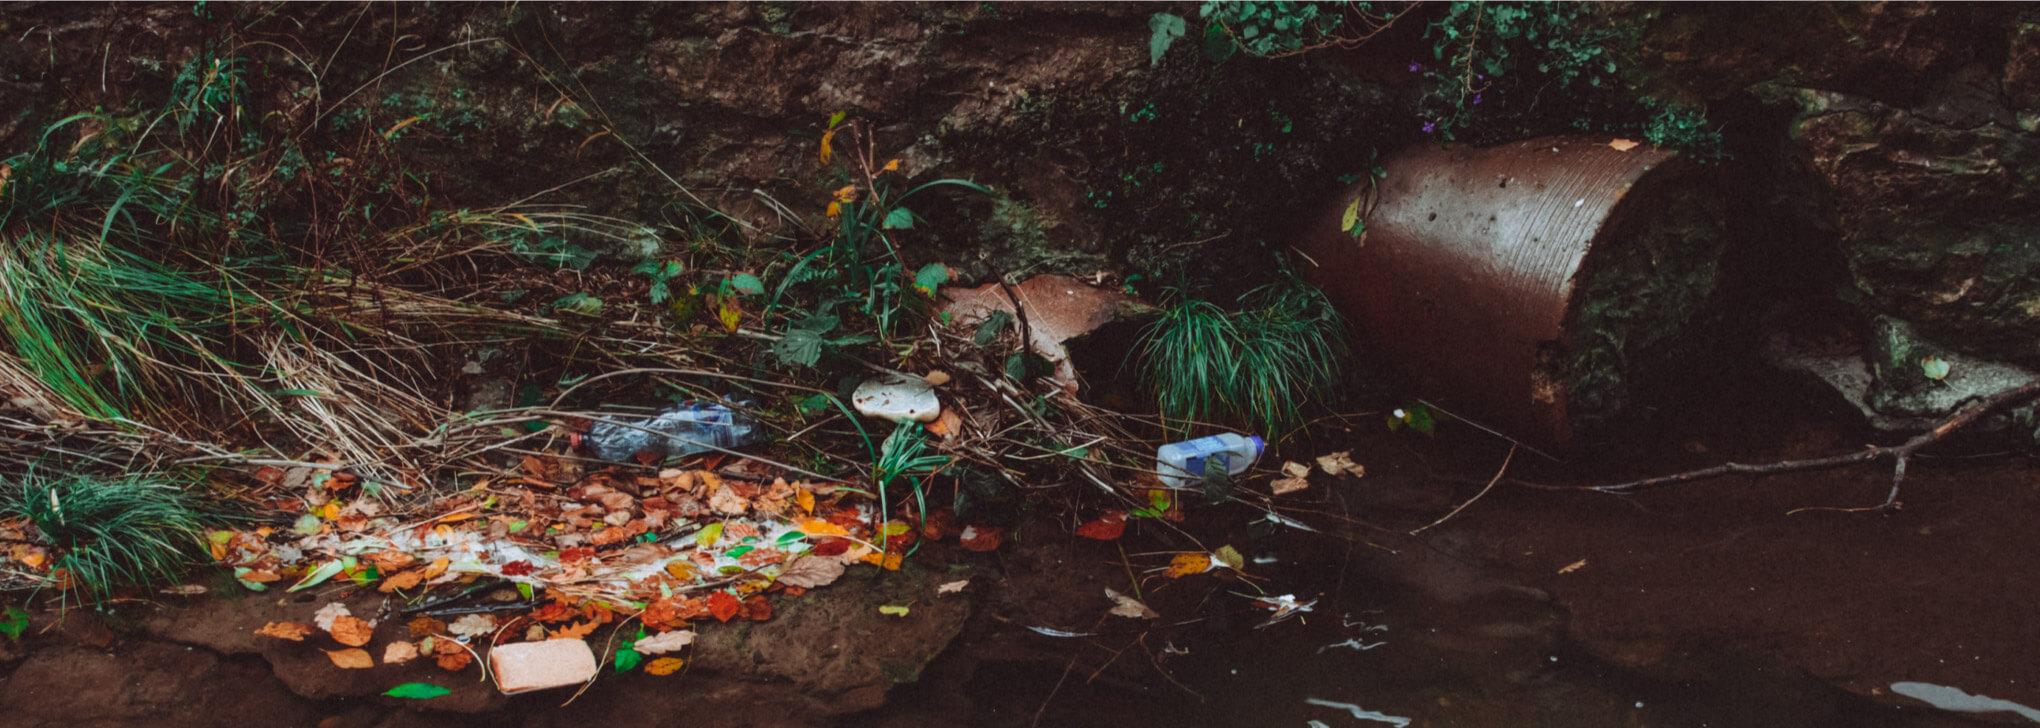 A clean Ocean requires Clean Rivers